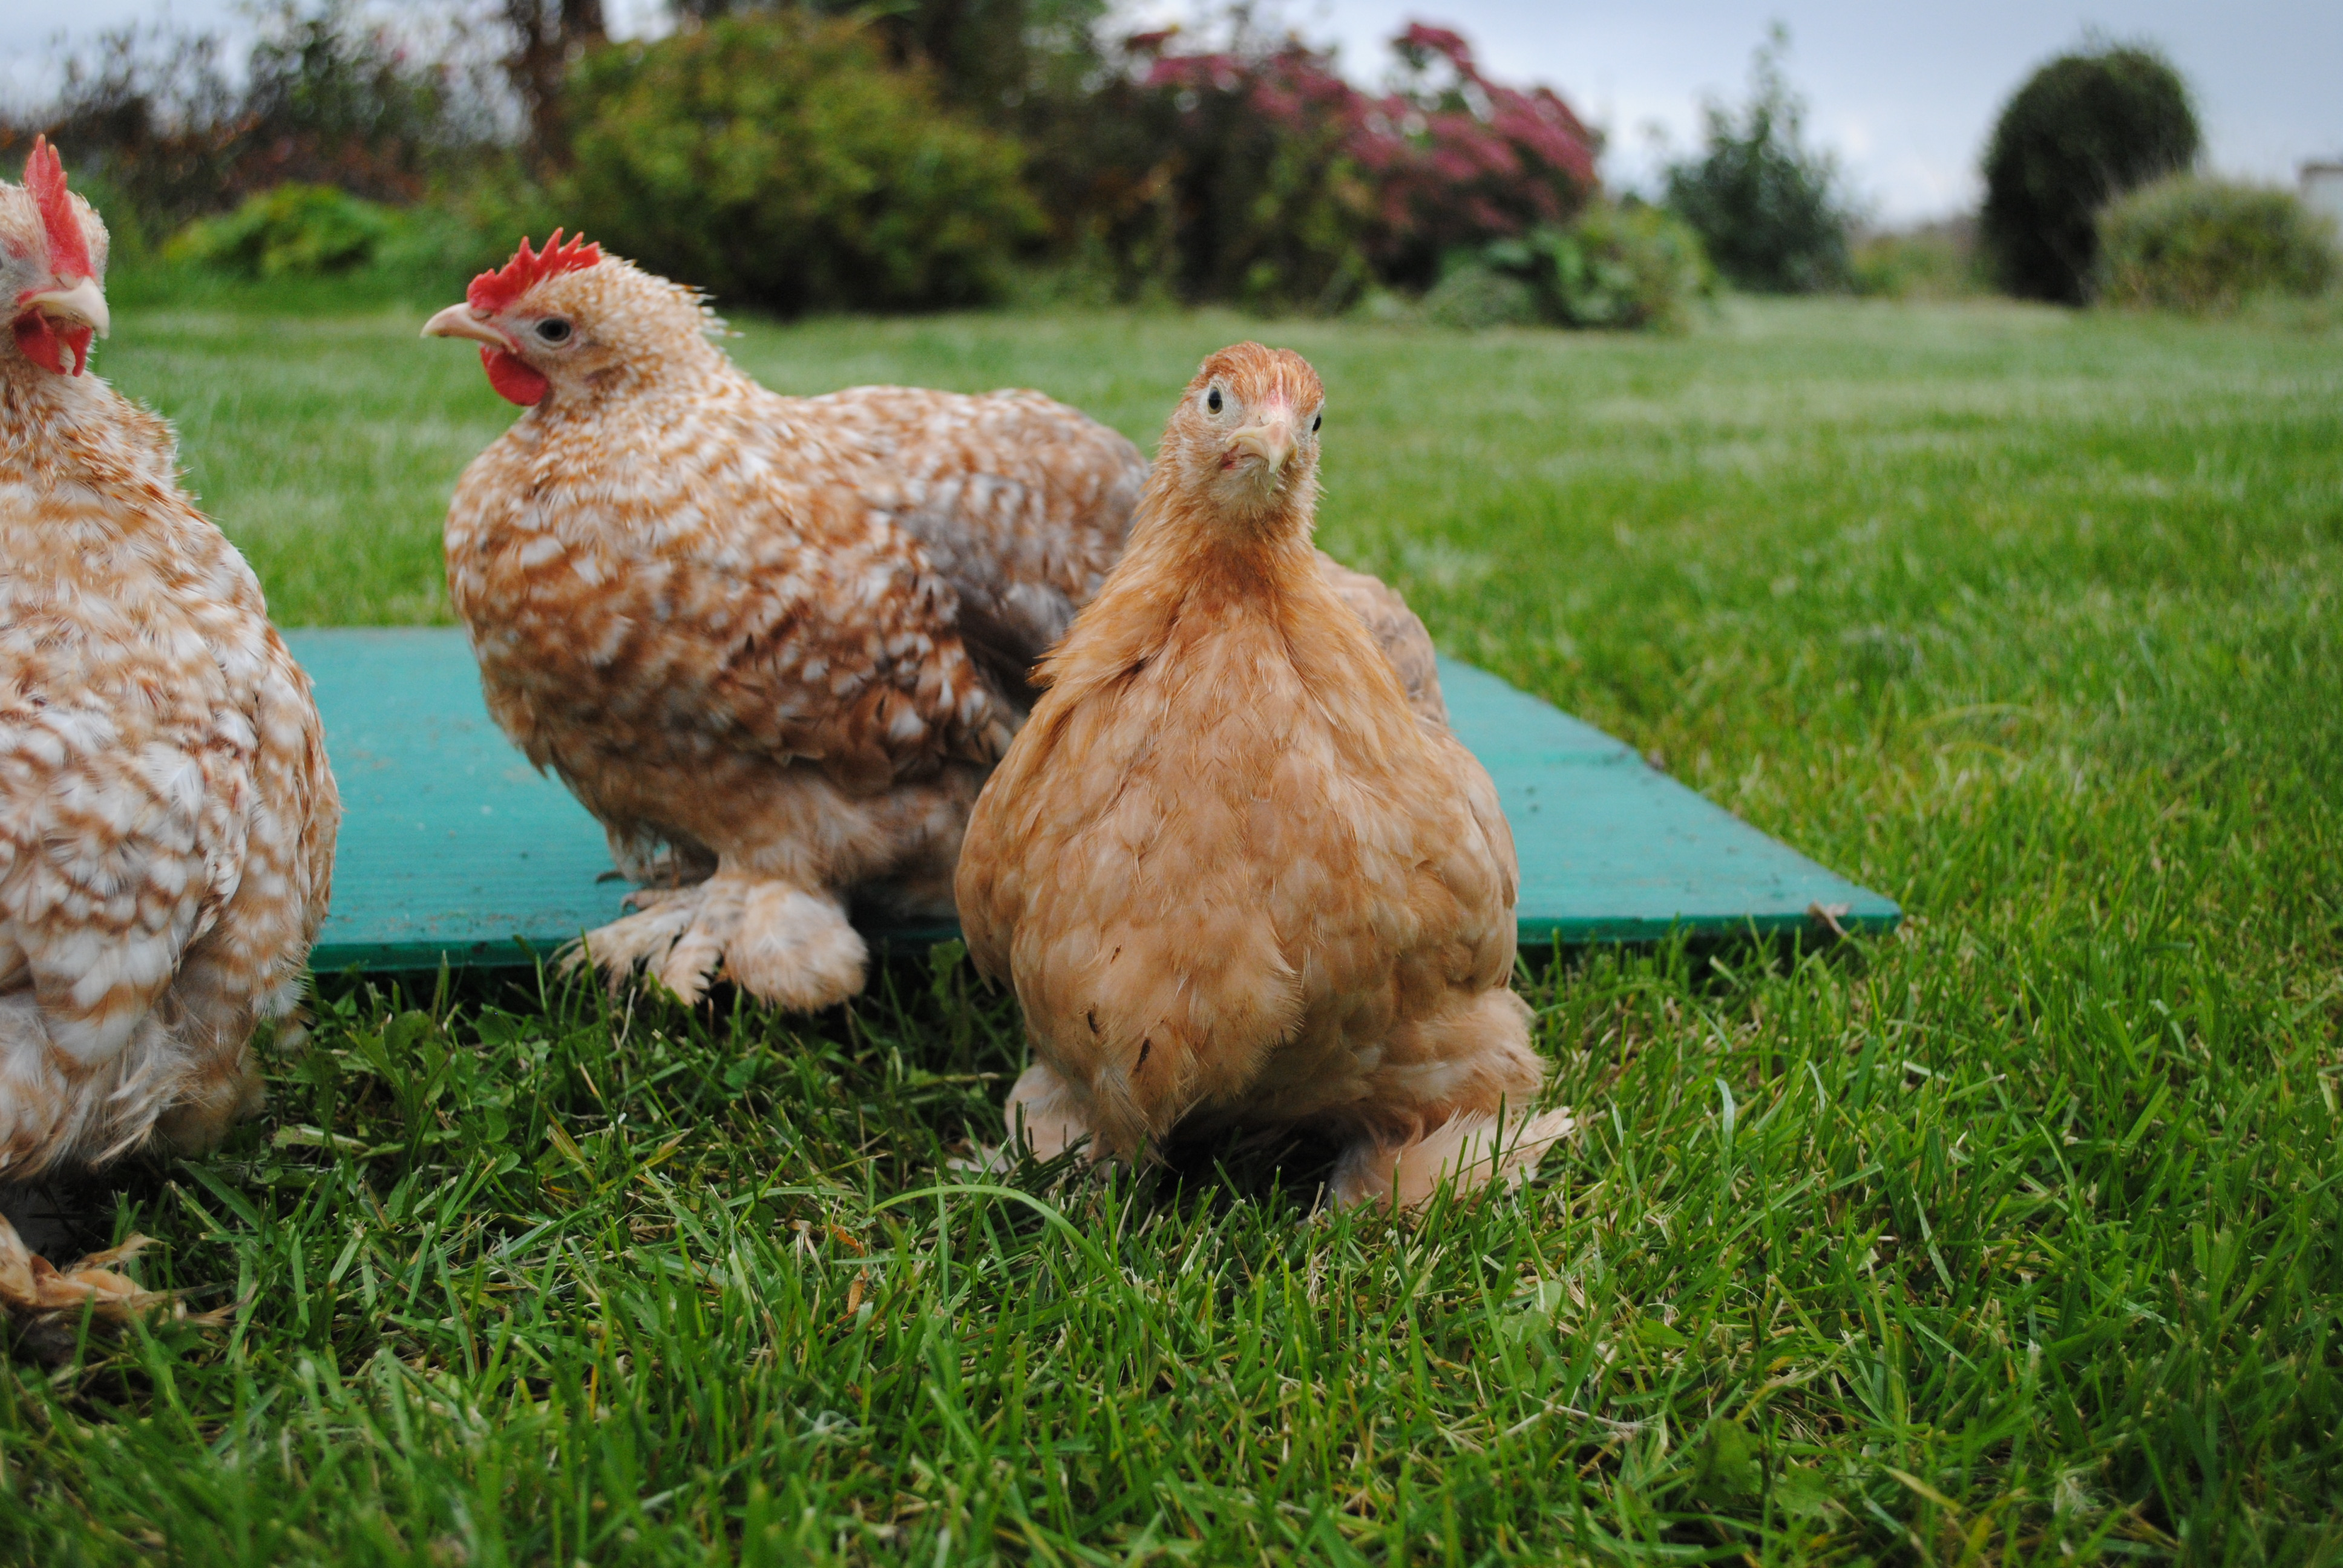 Грюнлегер порода кур – описание, фото и видео